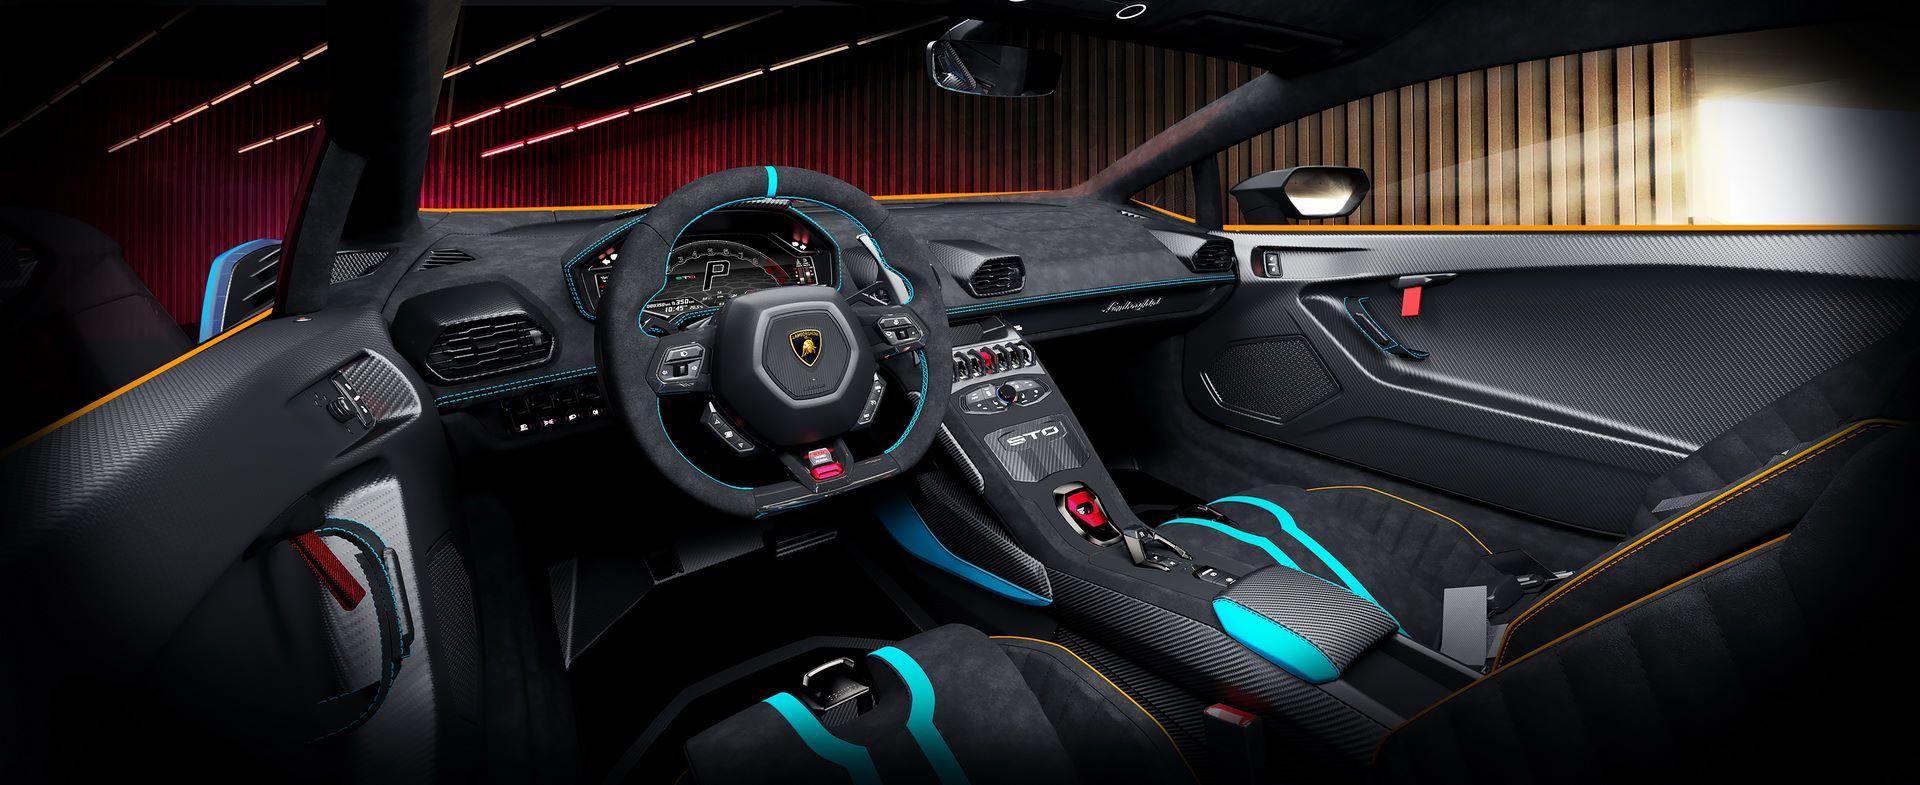 Lamborghini-Huracan-STO-2021-43